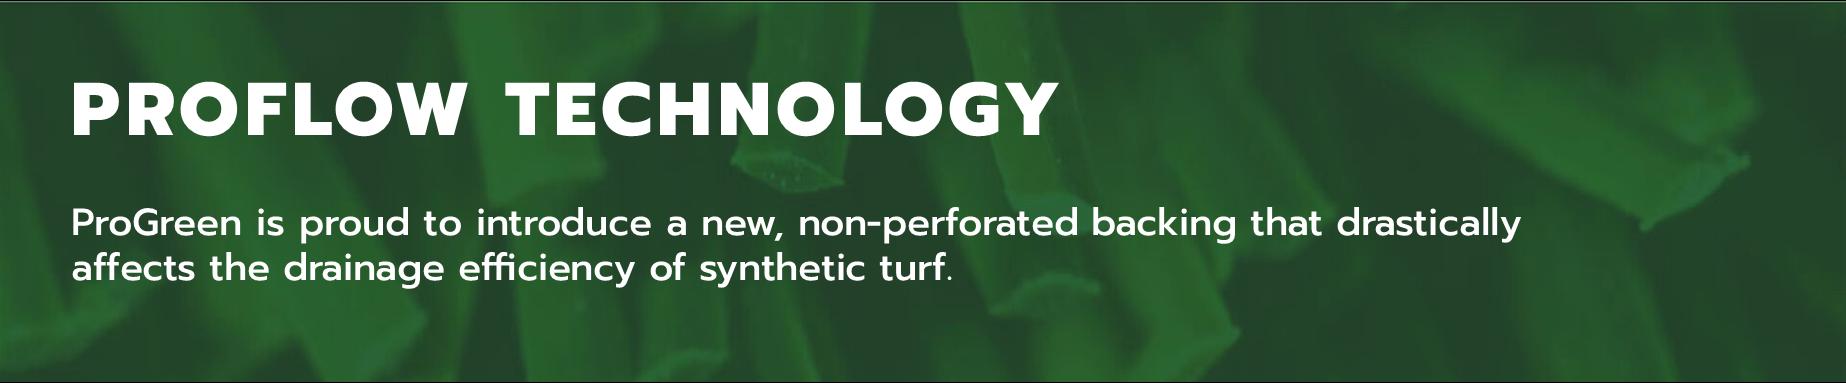 Proflow technologies banner